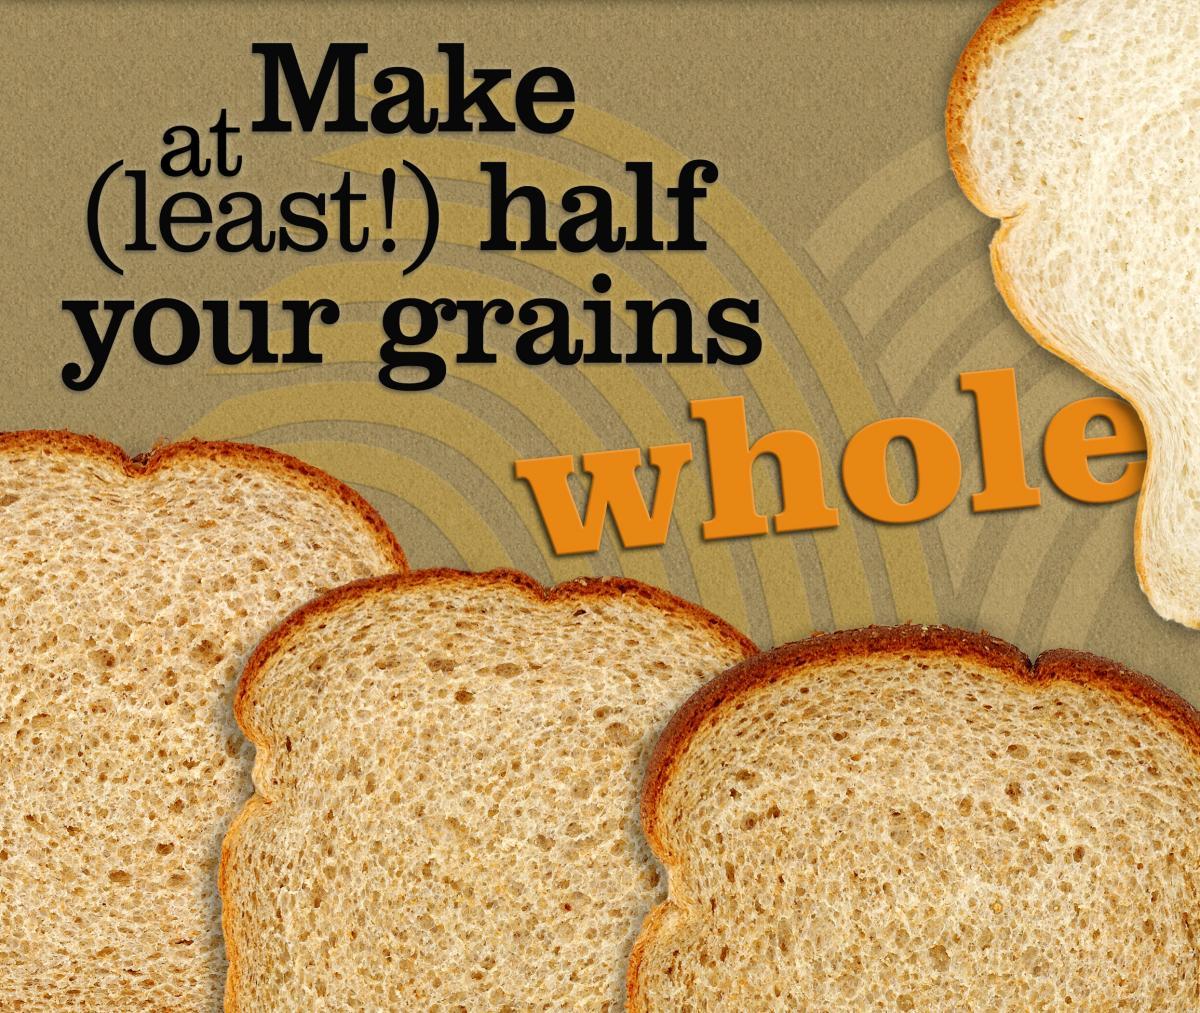 MakeHalfGrainsWhole.jpg